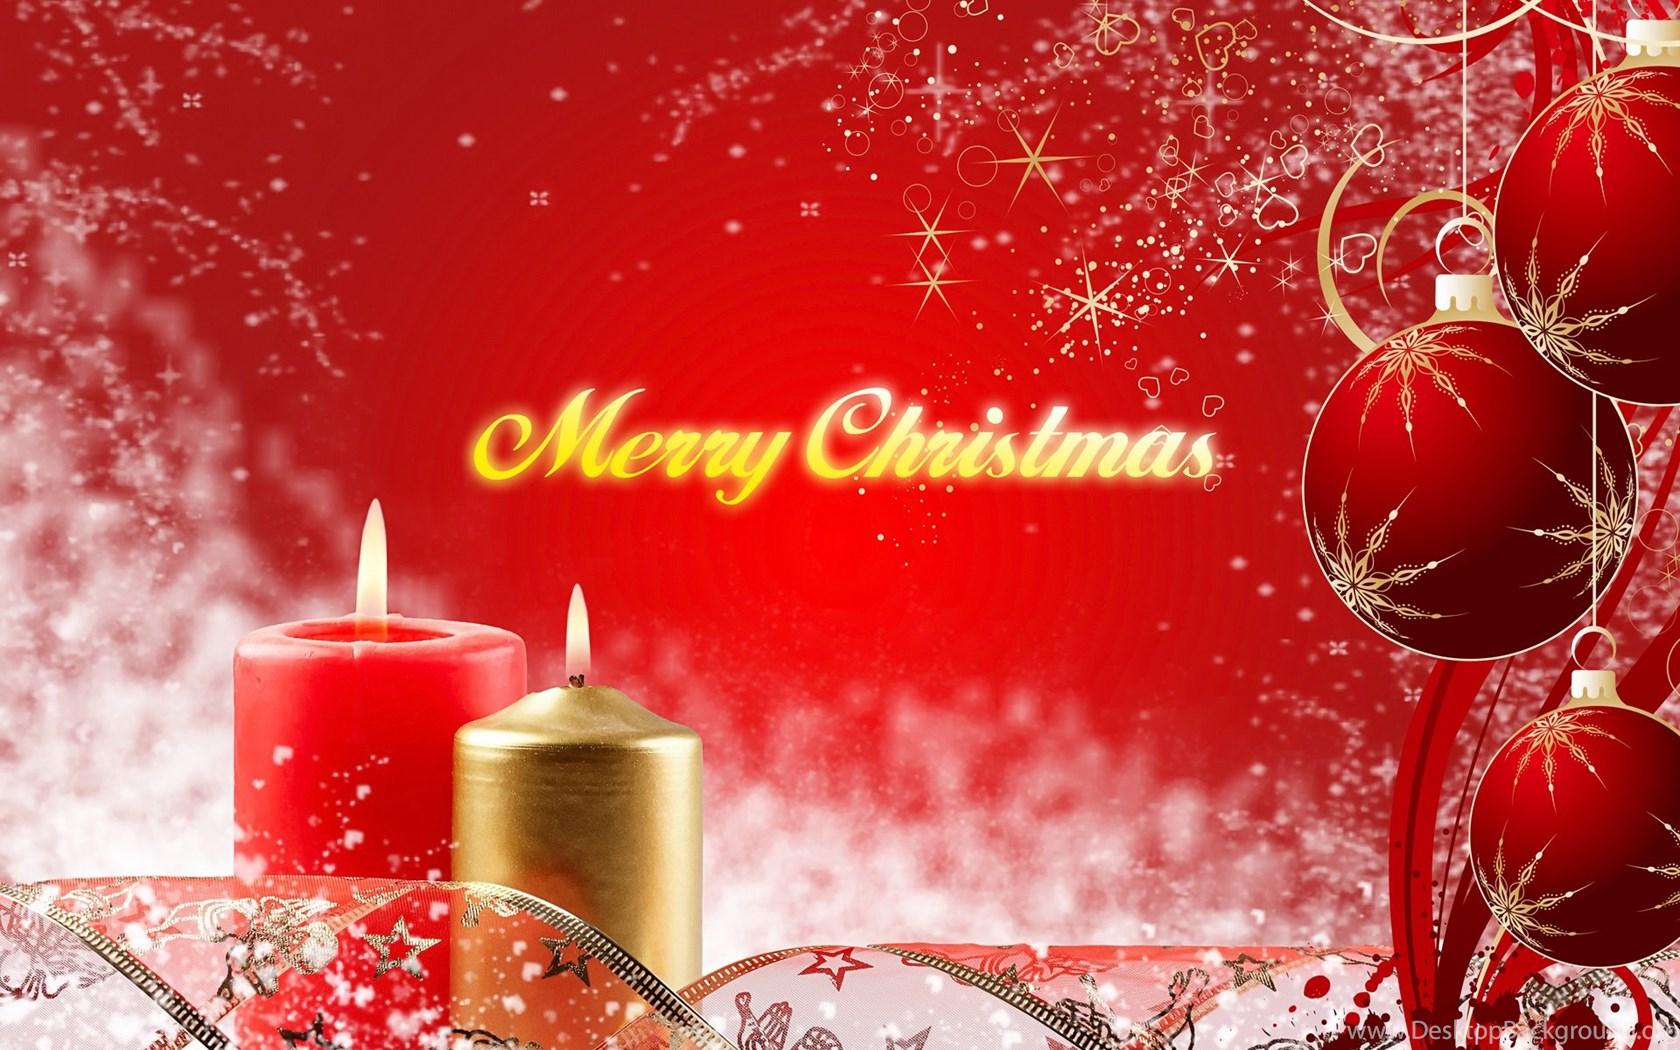 Christmas Greetings Background.Merry Christmas Greetings Wallpapers 1024x765px Desktop